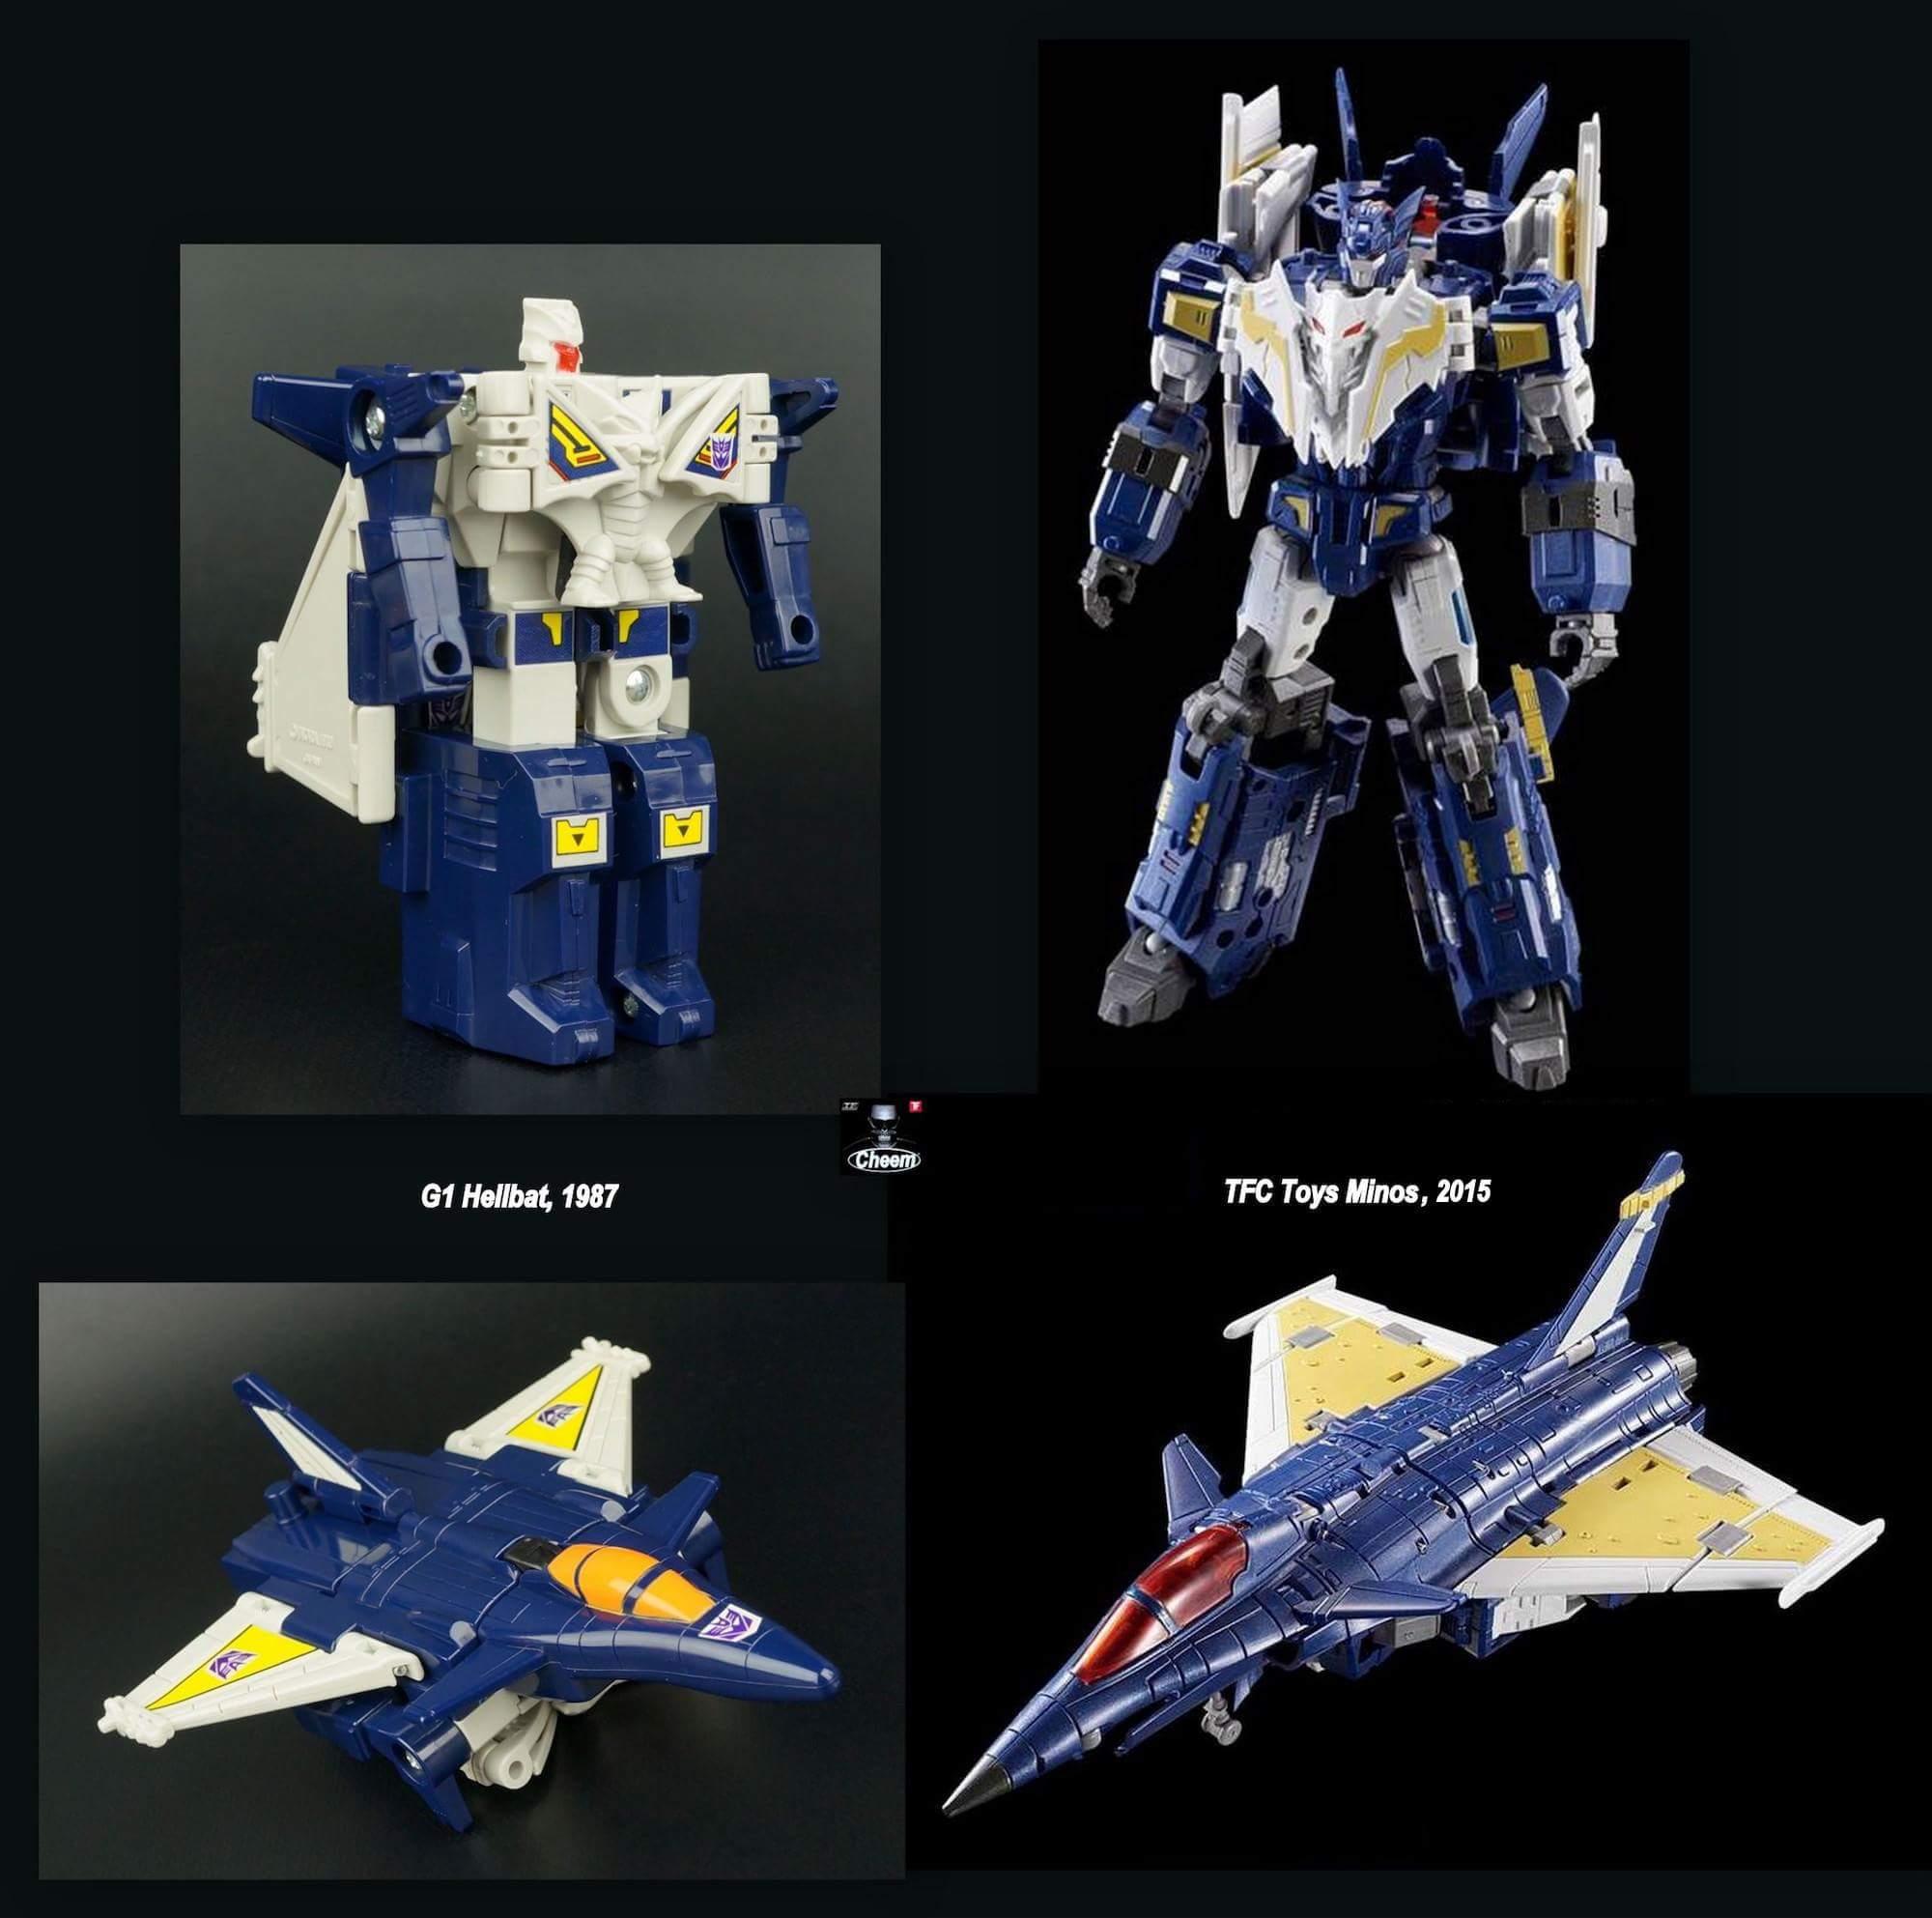 [TFC Toys] Produit Tiers - Jouet Hades - aka Liokaiser (Victory) - Page 3 Nk2eHze3